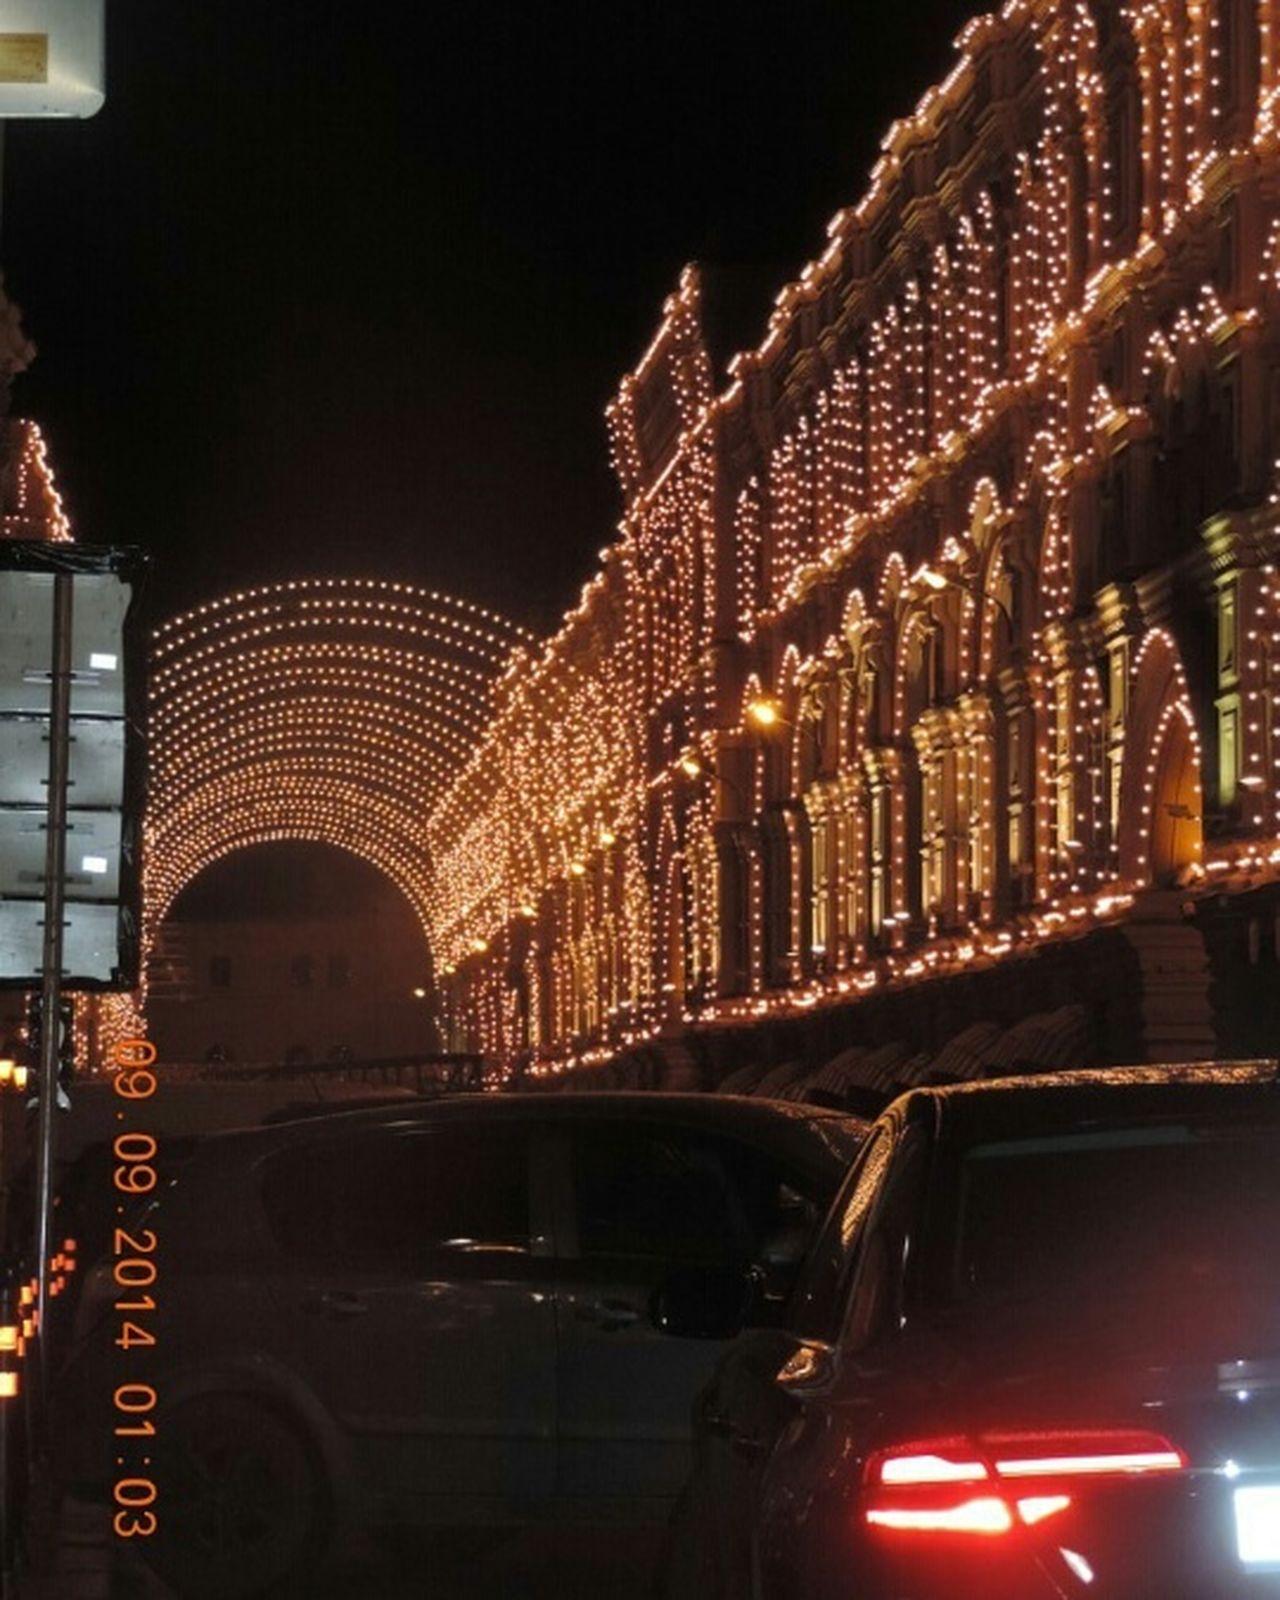 Night Illuminated Cityscape City Neon Москва москва russiaмосквагостиныйдвор москва